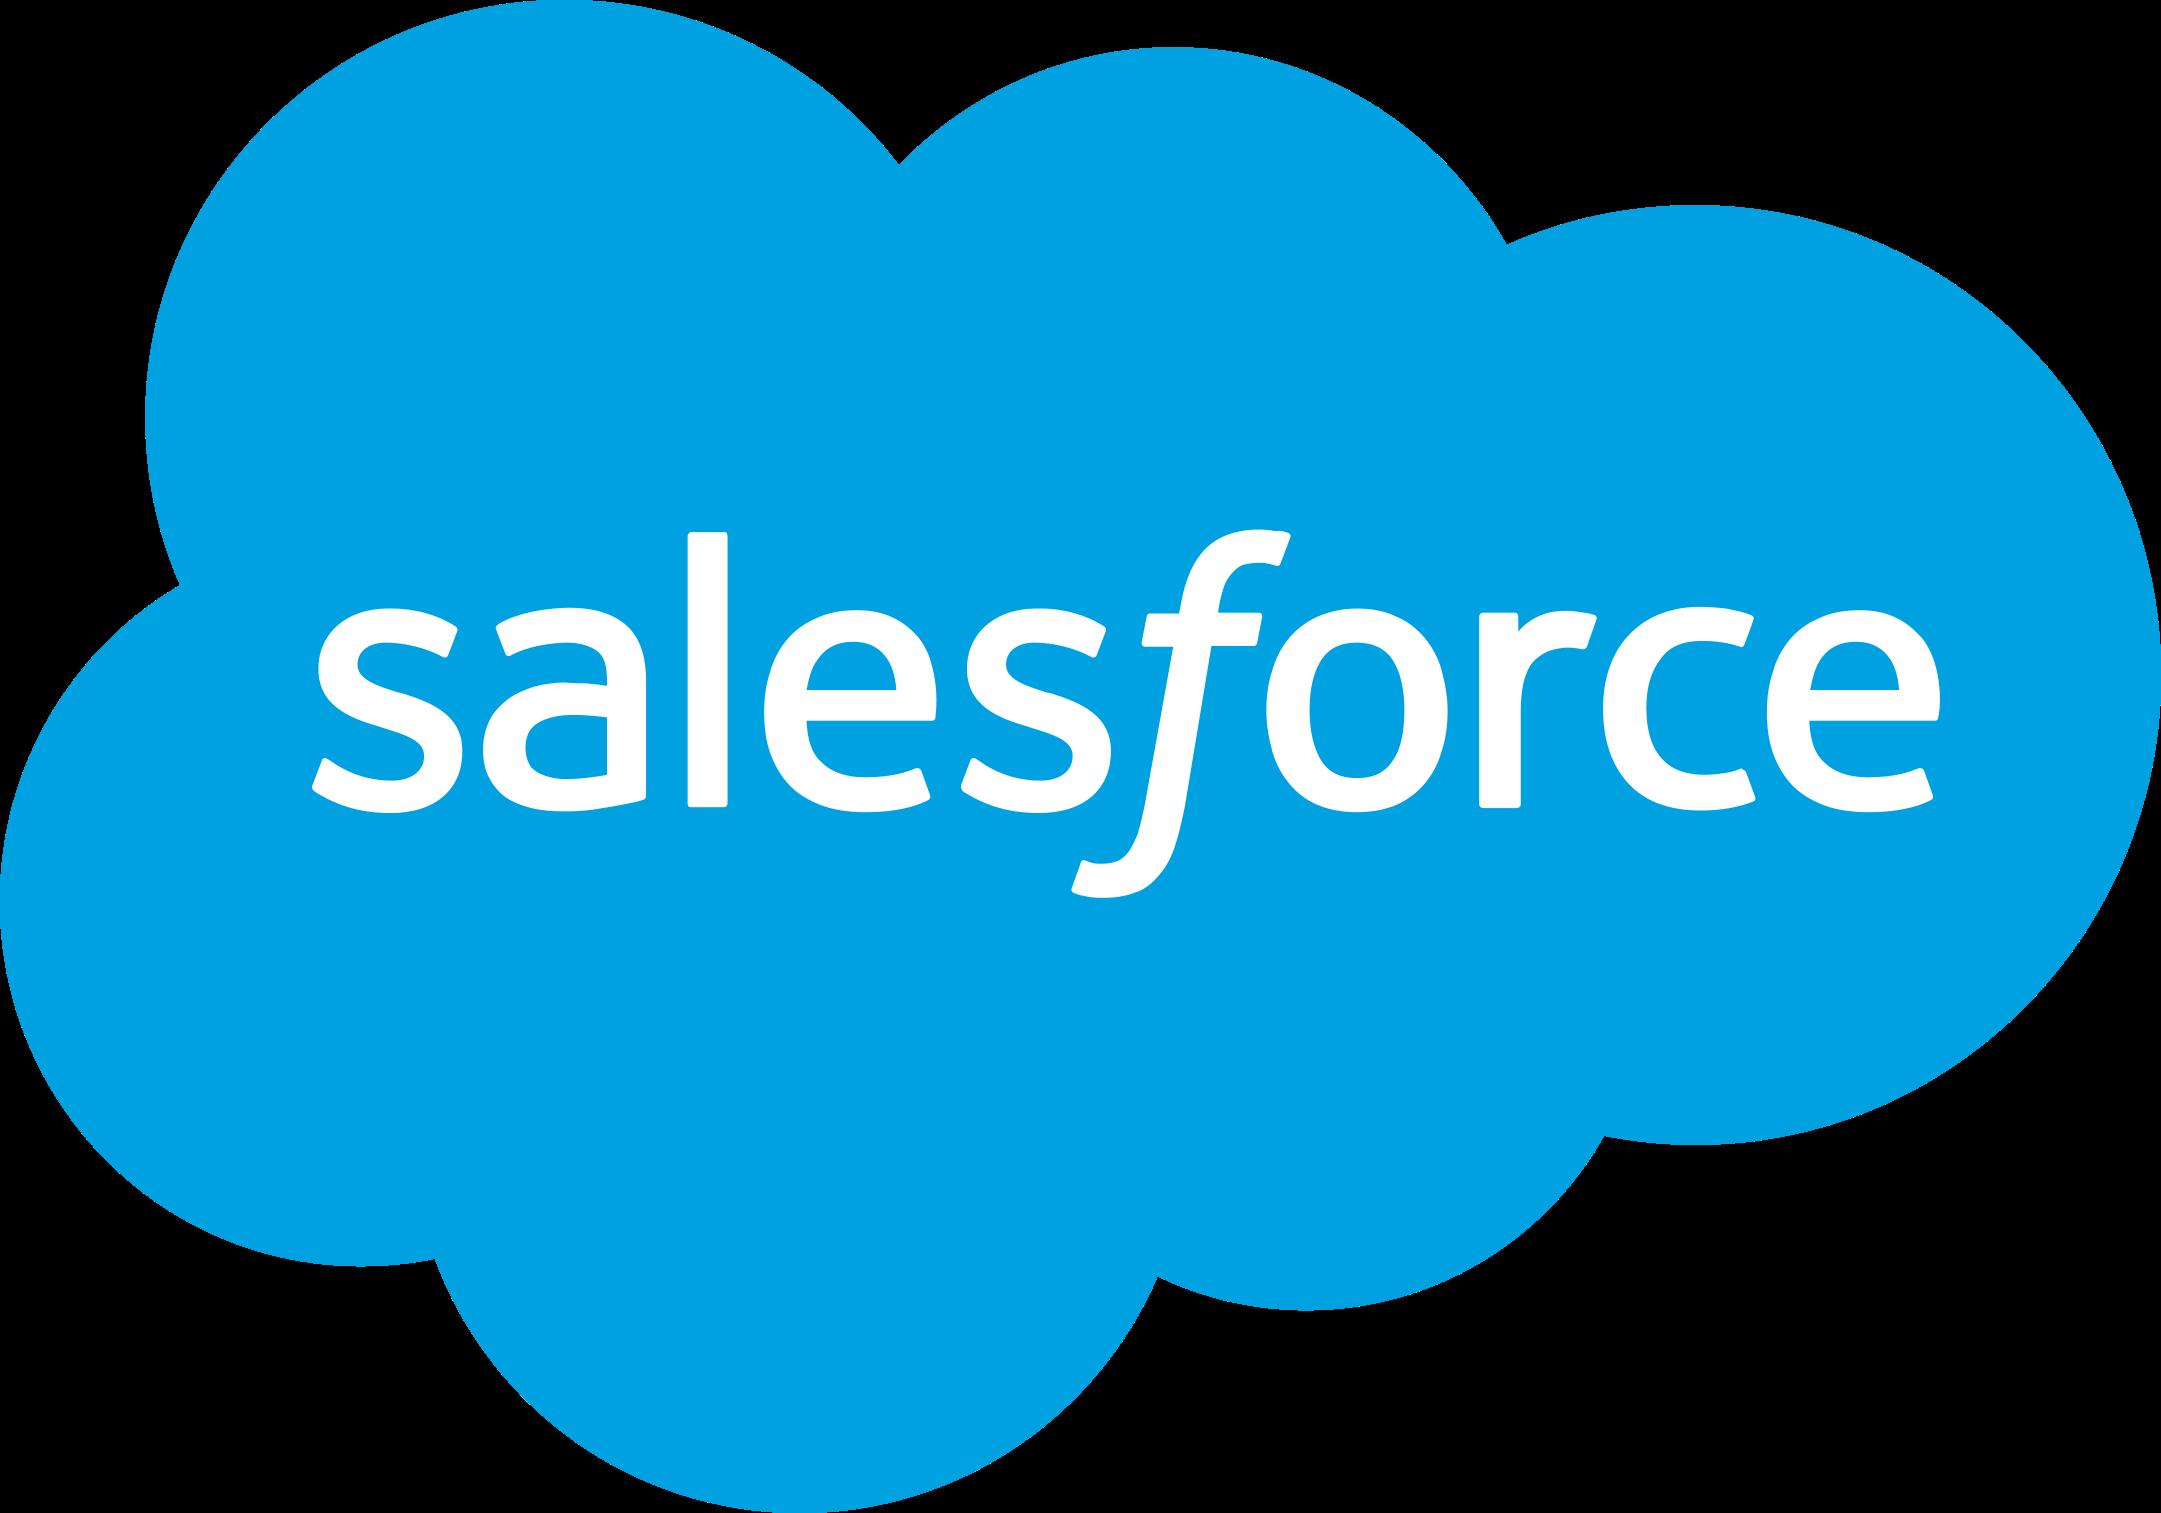 salesforce logo 1 - Salesforce Logo